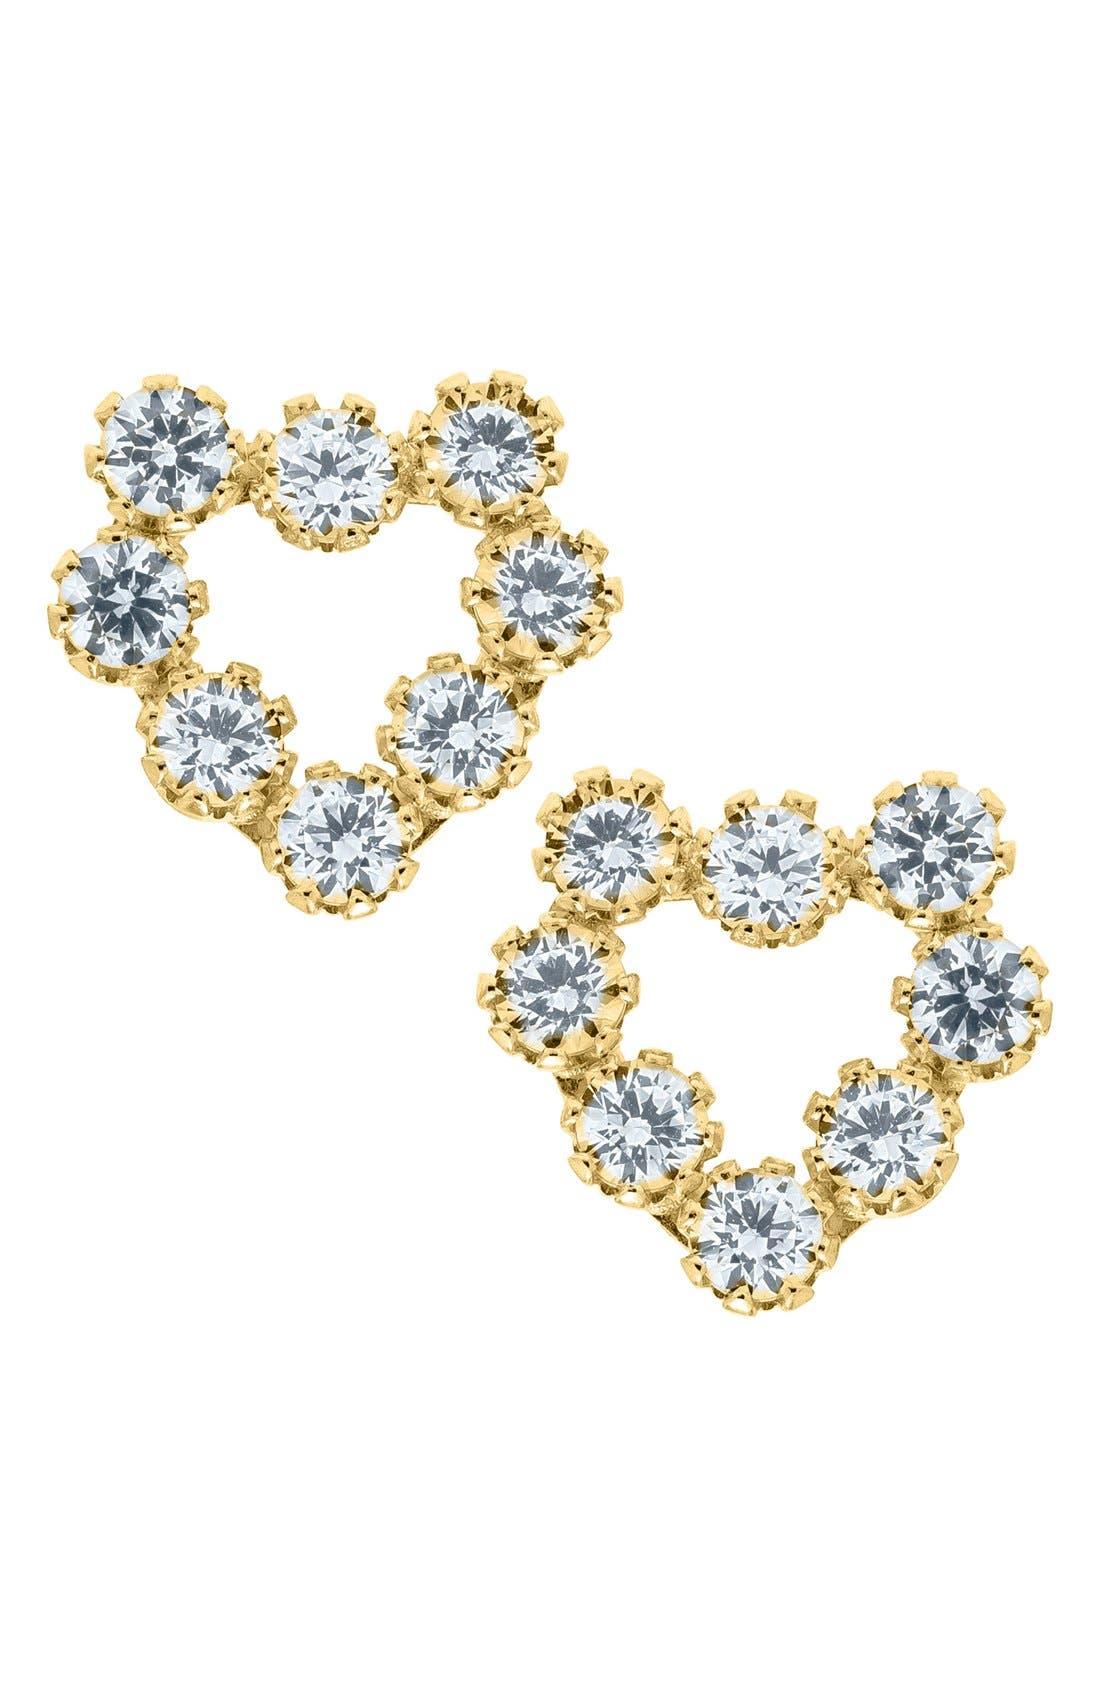 14k Gold & Cubic Zirconia Heart Earrings,                         Main,                         color, Gold